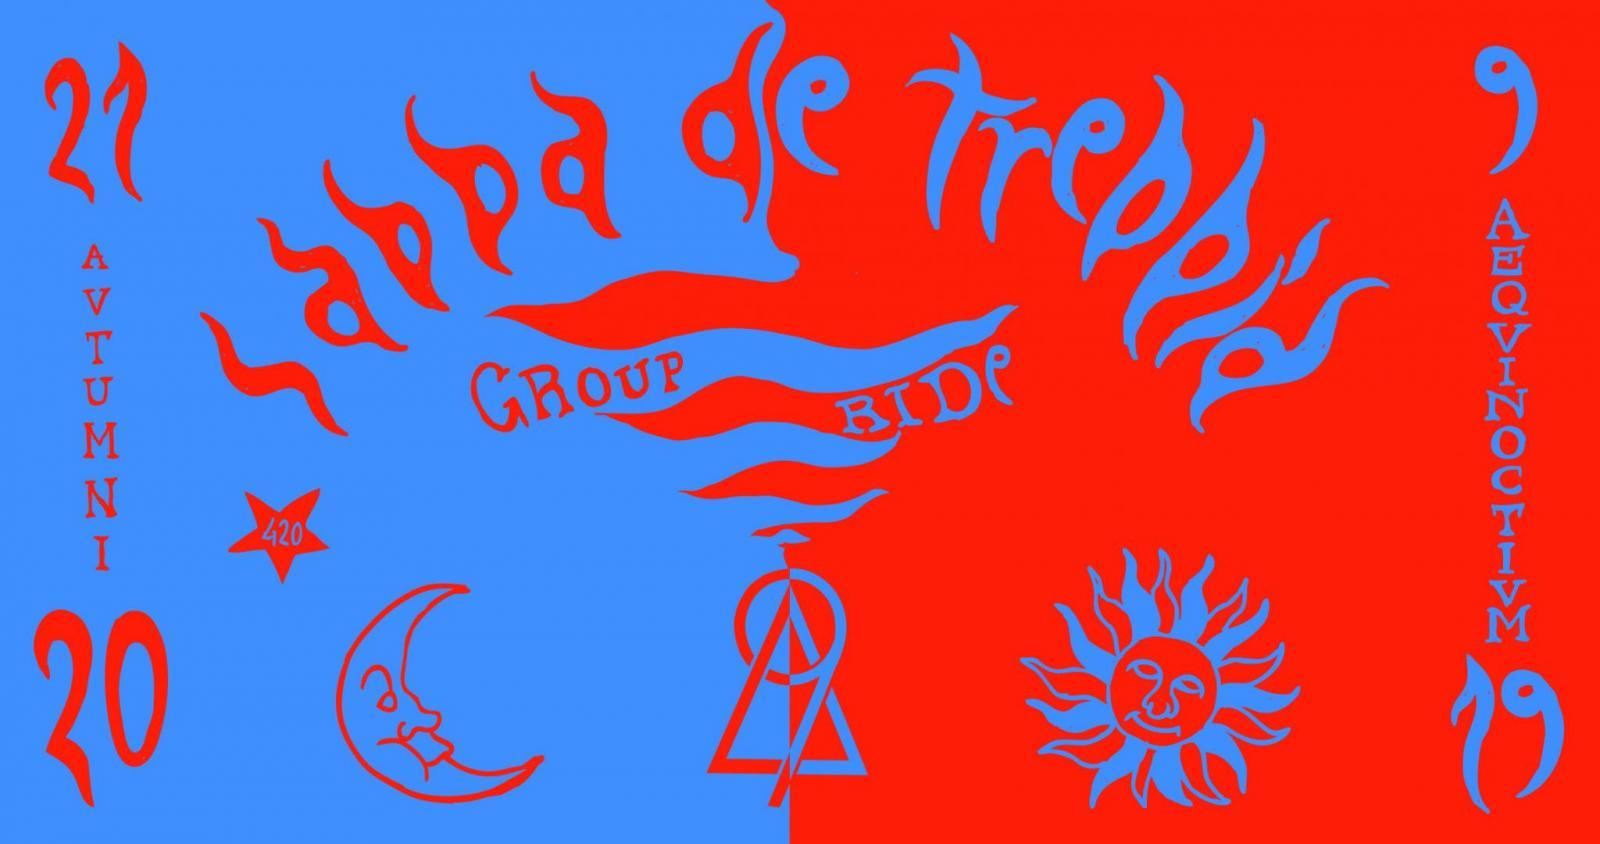 spoke.thumb.jpg.c8980b275b6cdbd6ac5807beb5232d12.jpg